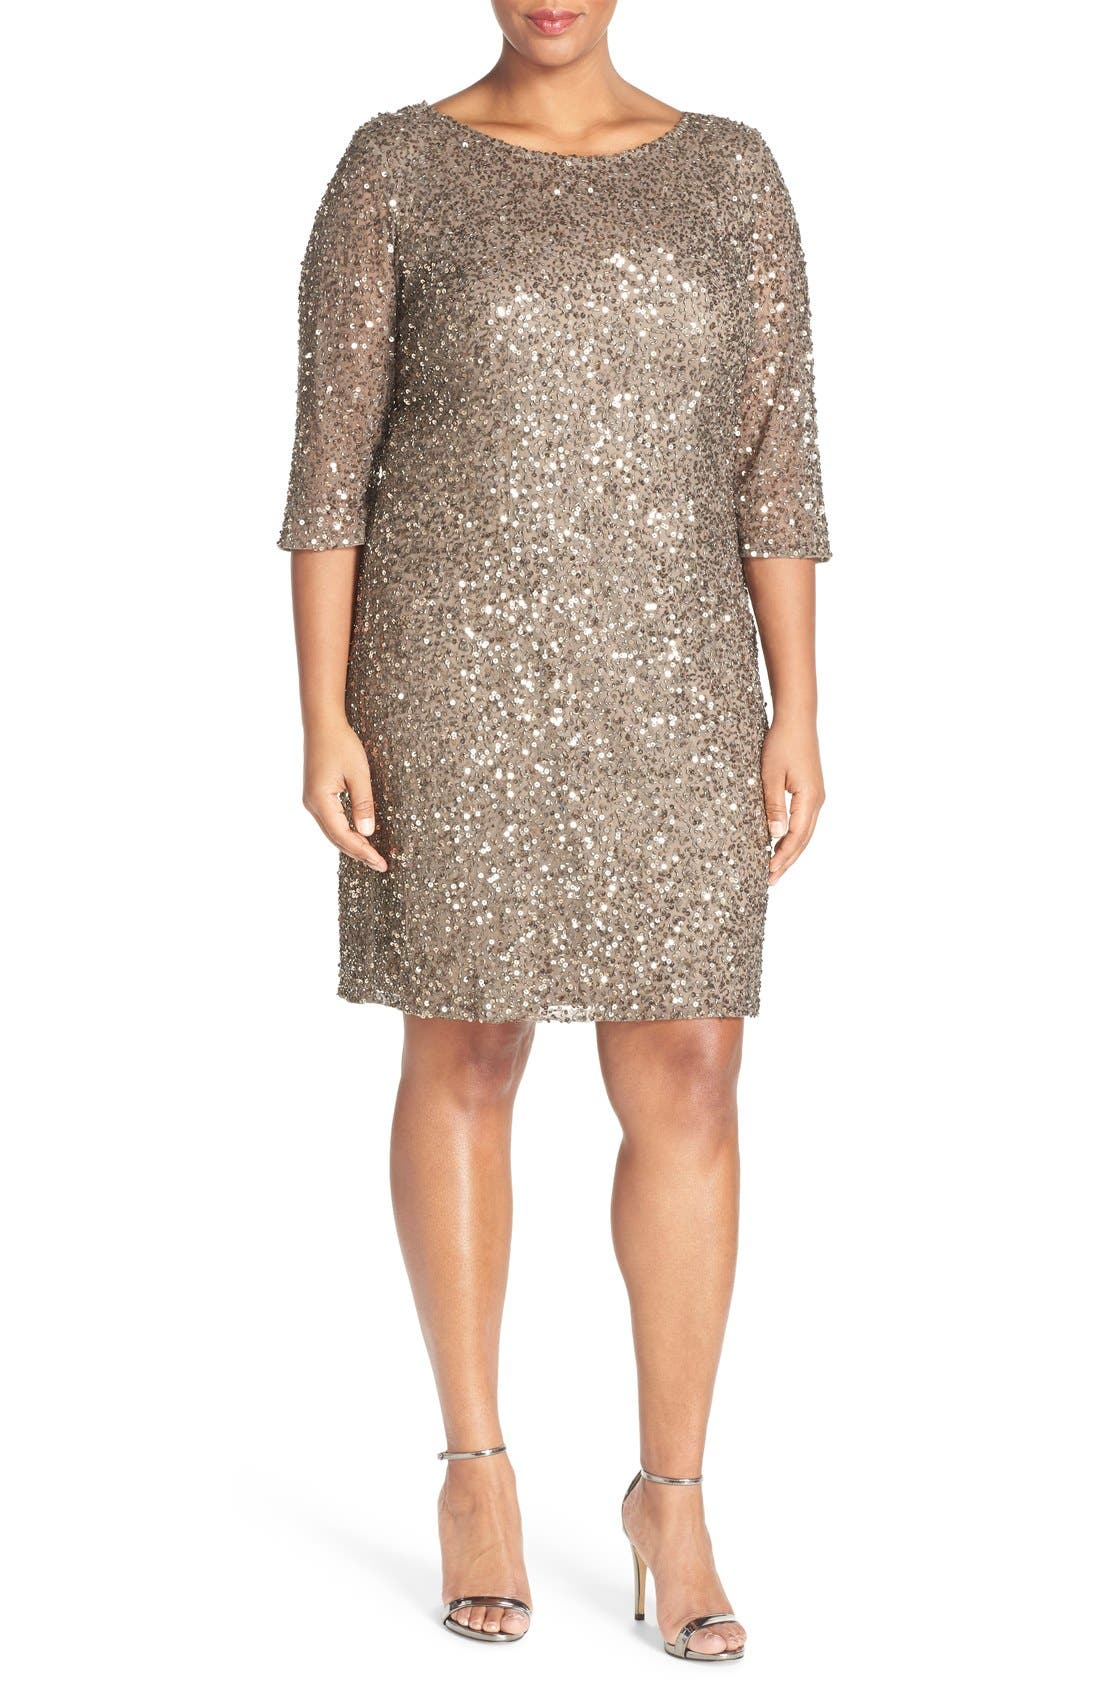 Alternate Image 1 Selected - Pisarro Nights Draped Back Beaded Dress (Plus Size)